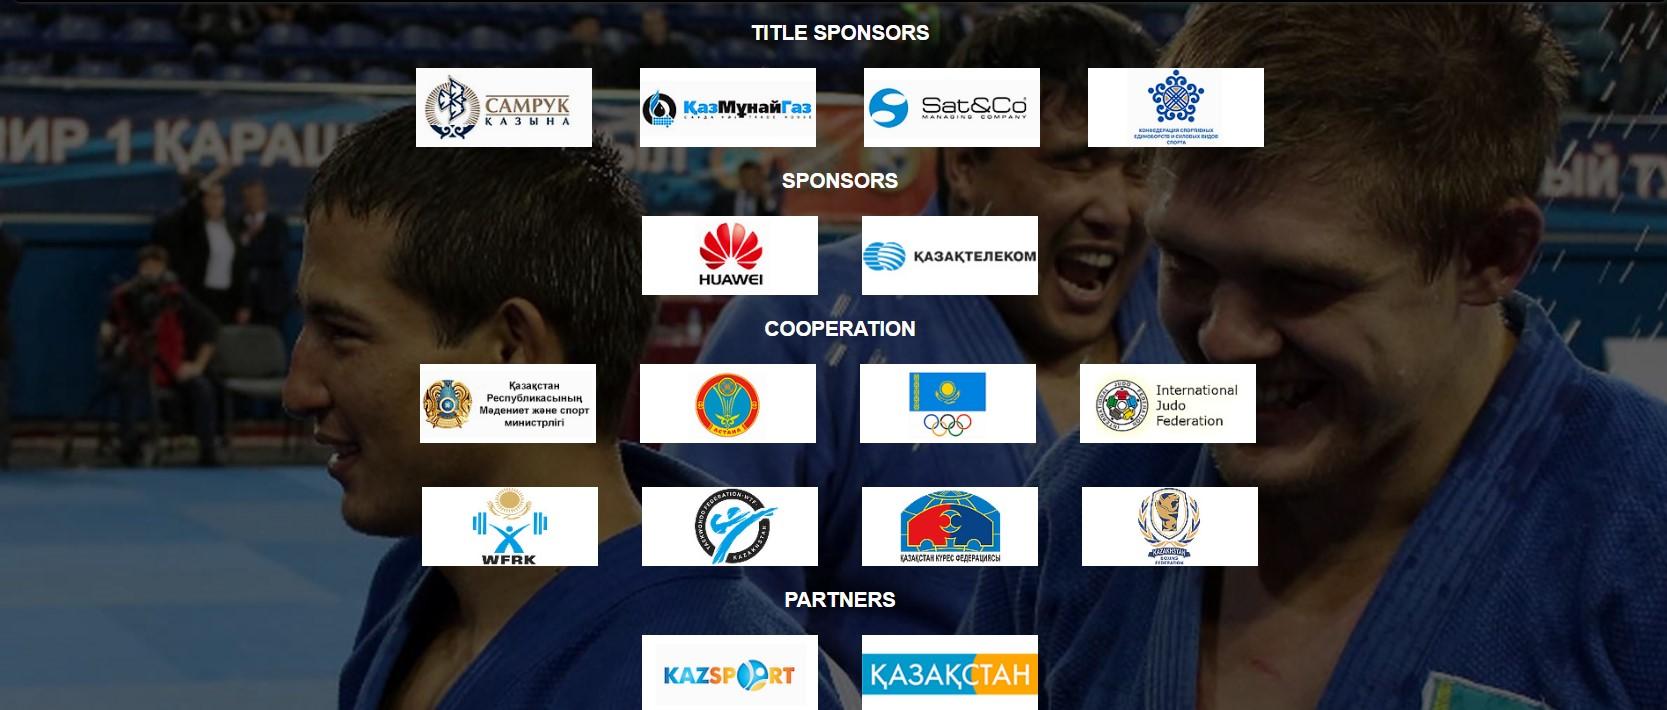 footer_sponsors